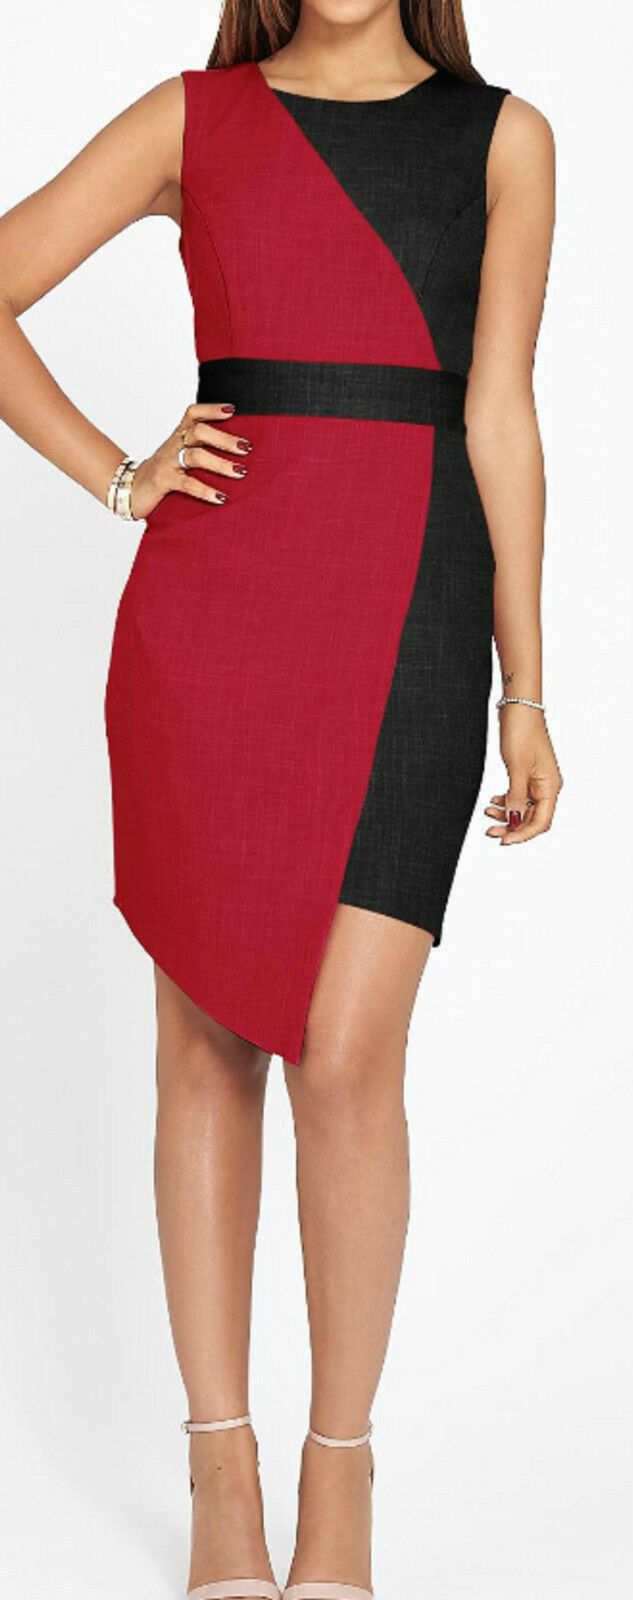 ROCHELLE HUMES ASYMMETRIC COLOUR BLOCK DRESS Größe 12